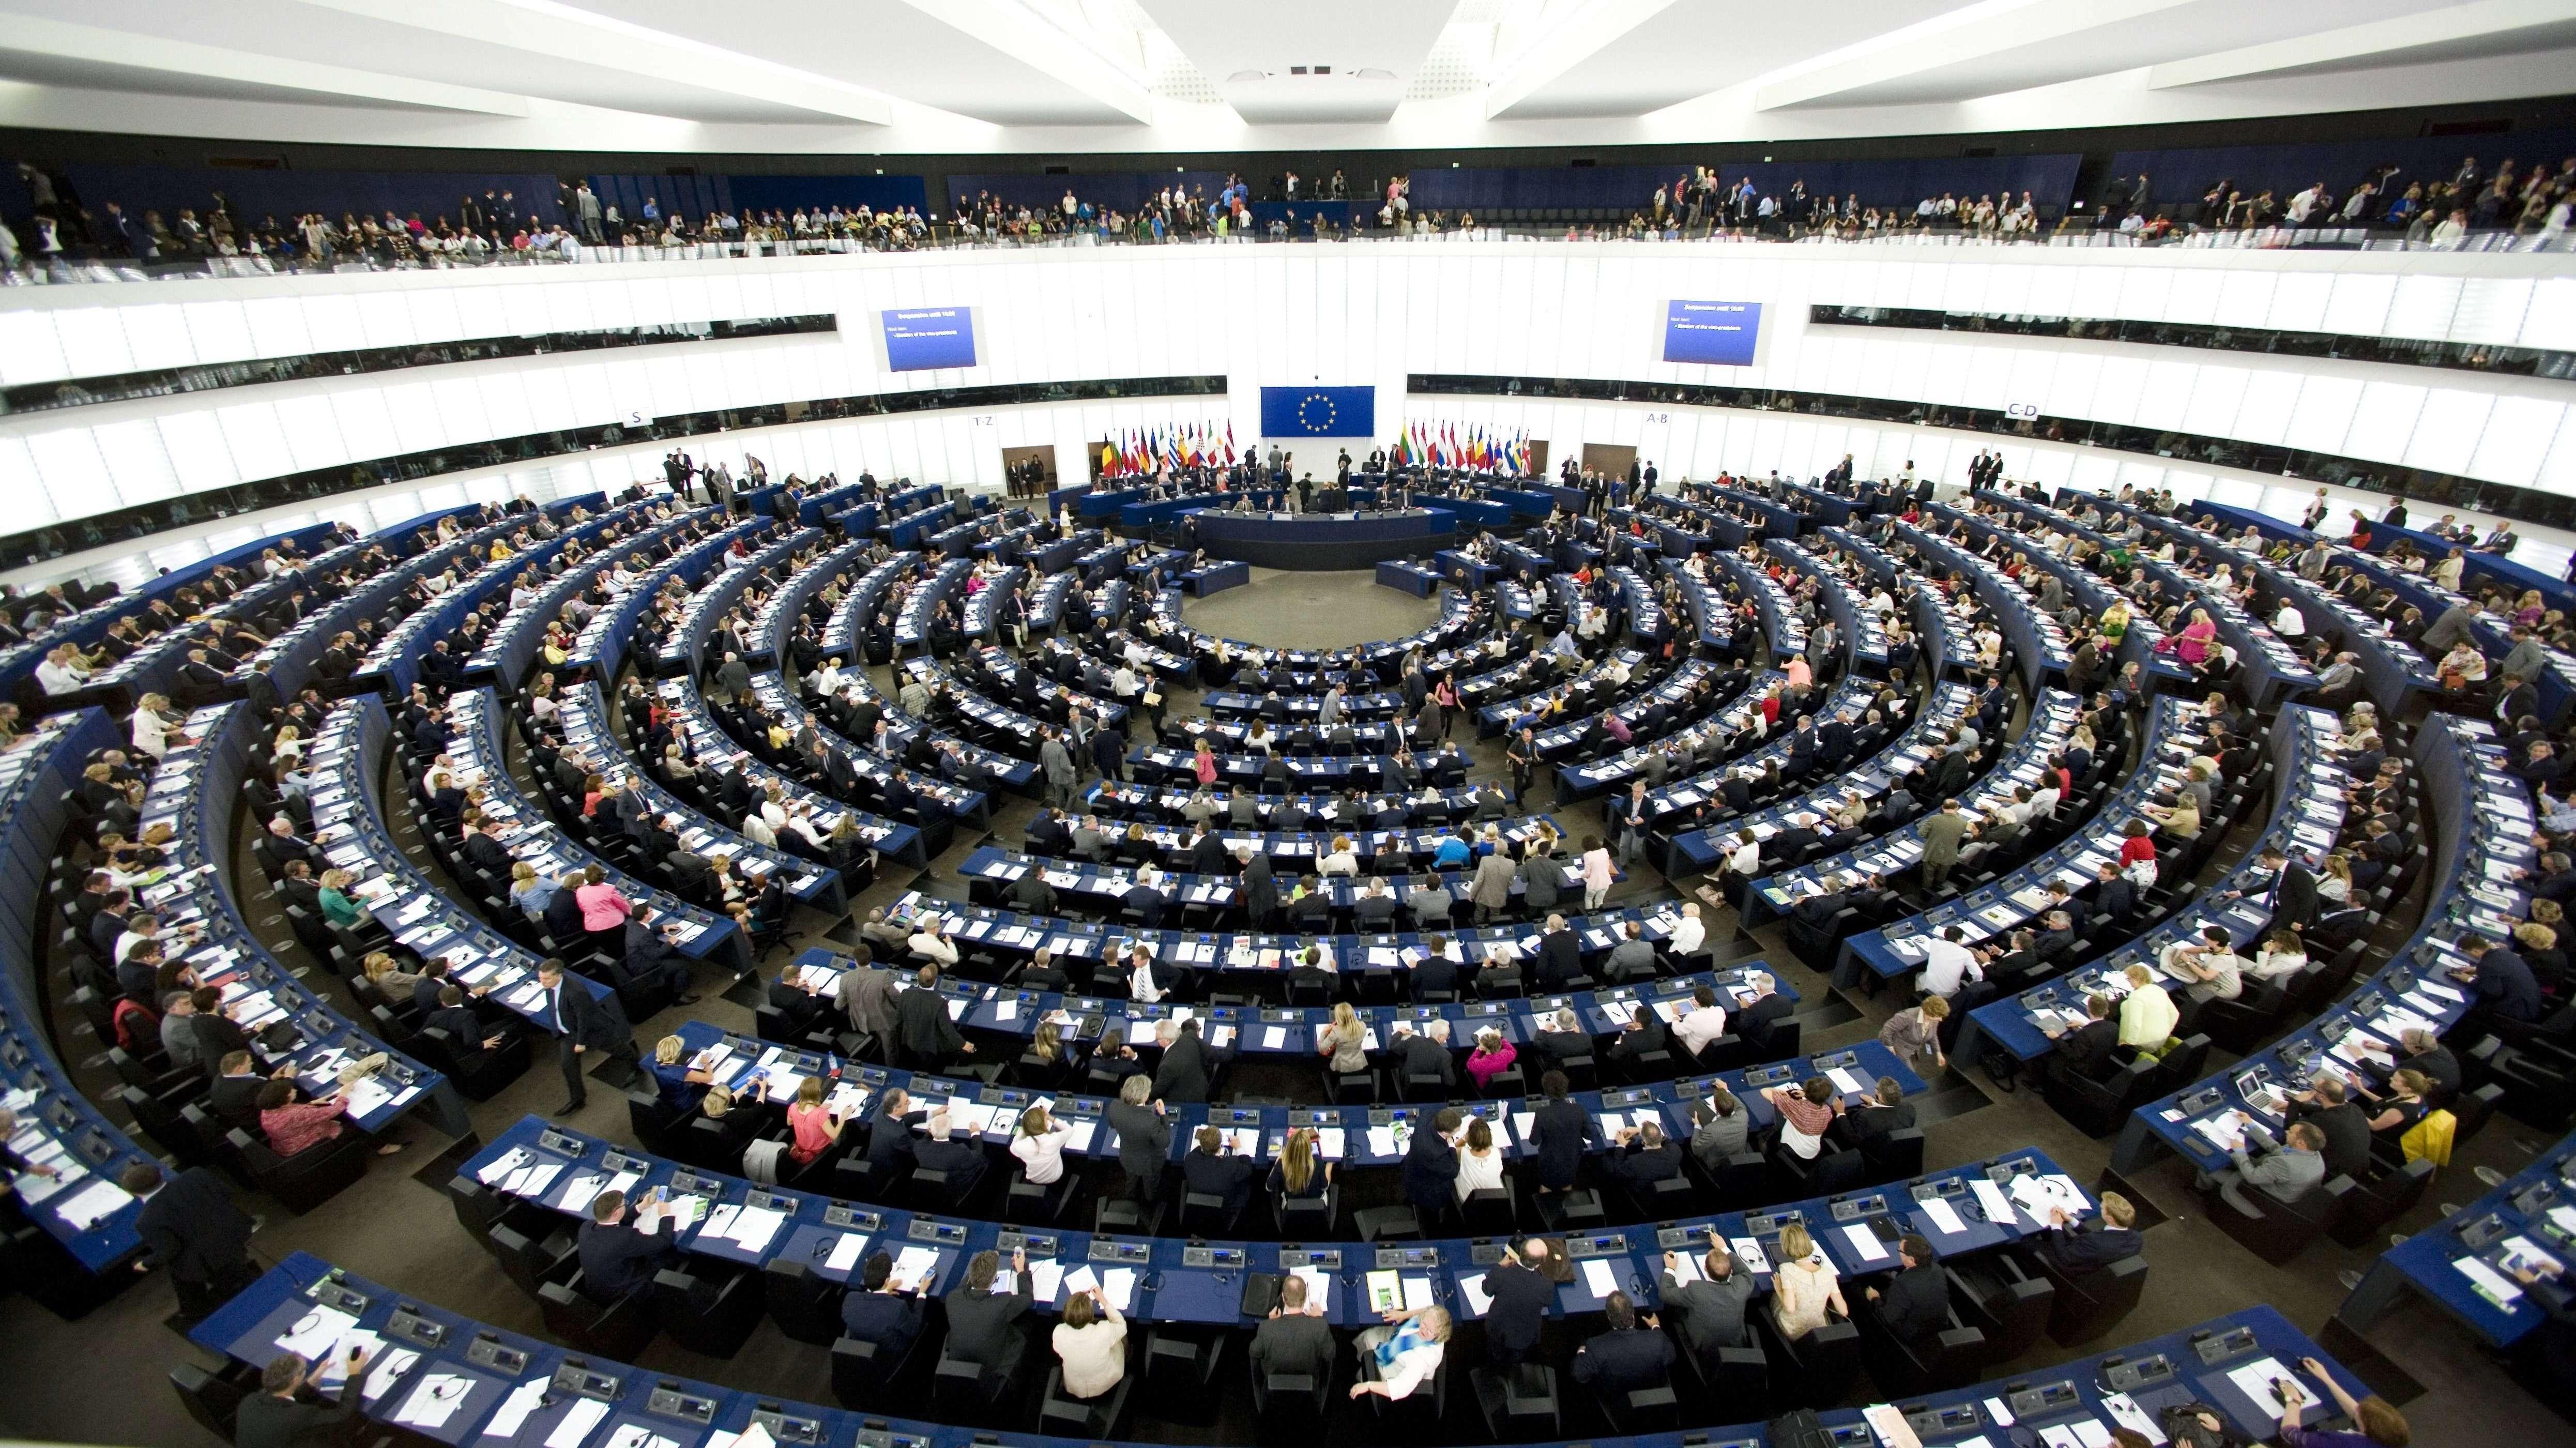 Plenum des Europaparlaments